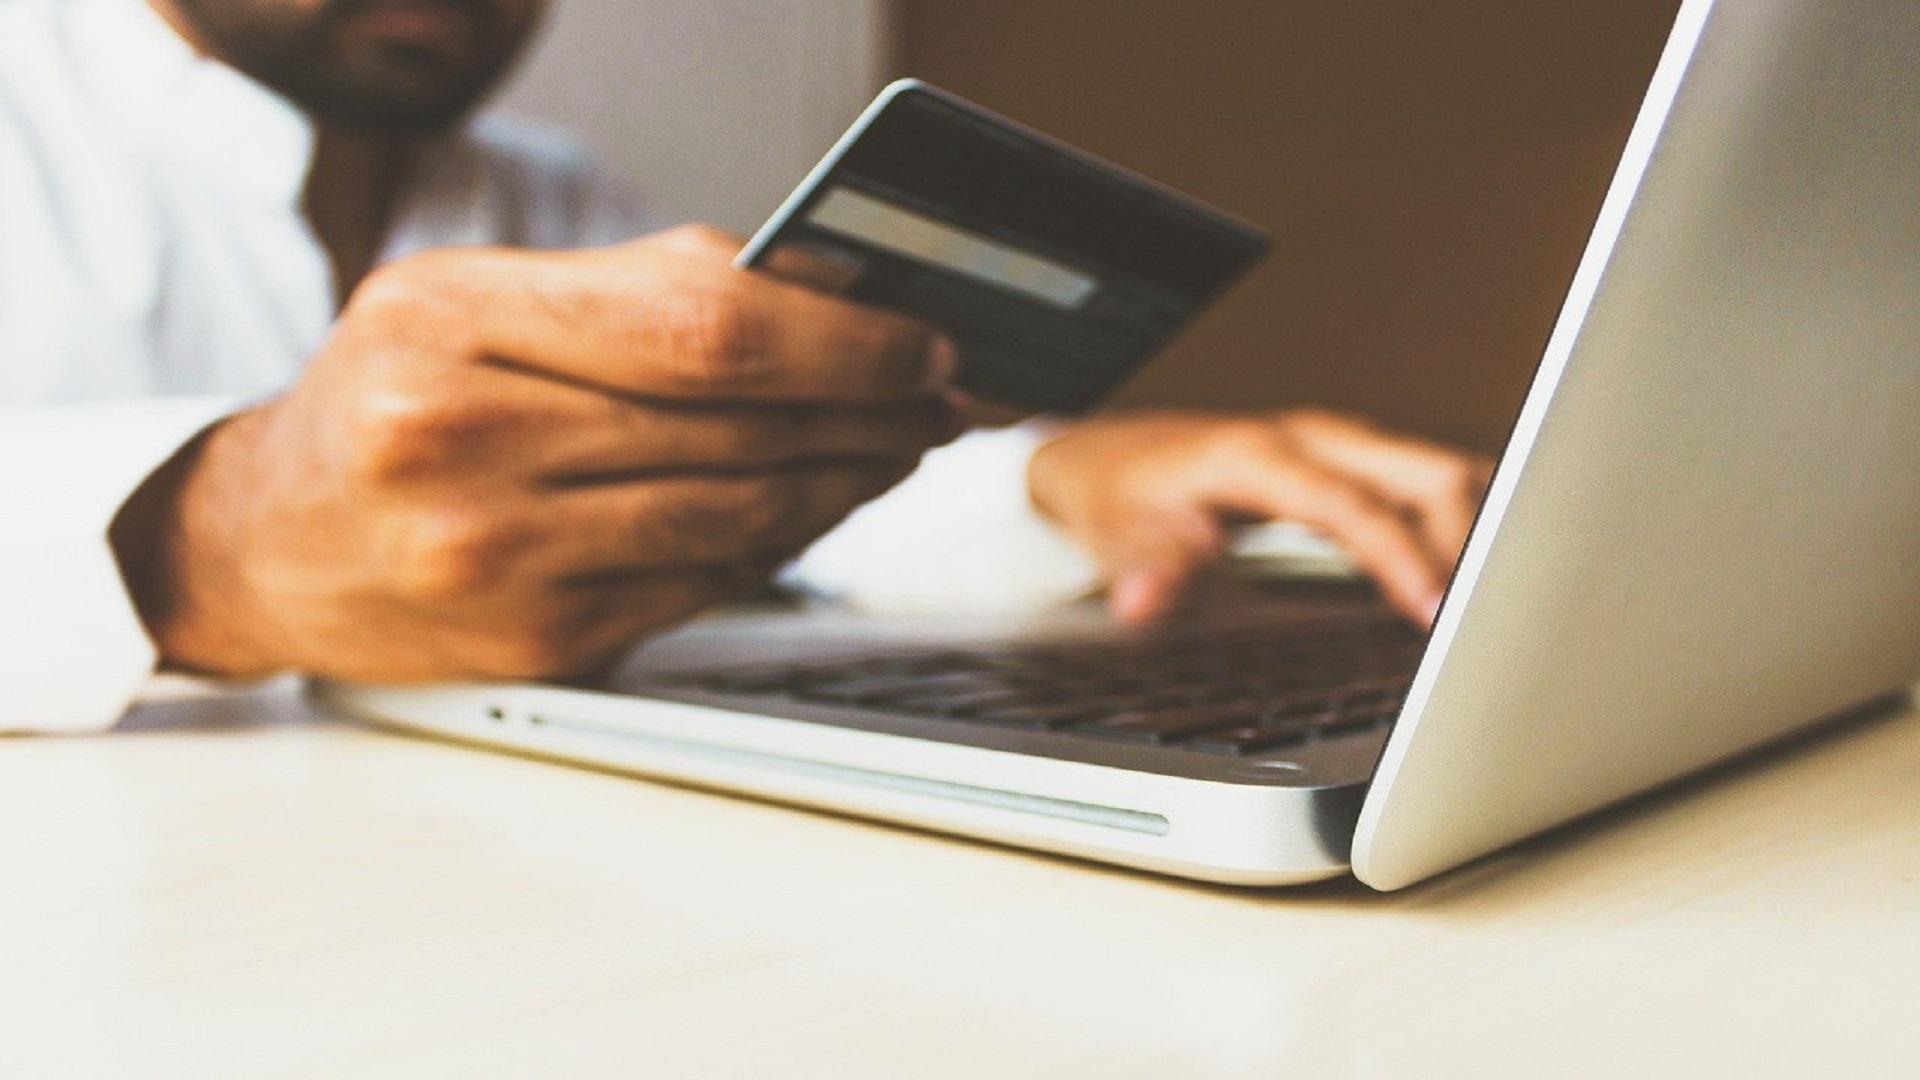 JCBクレジットカード4種類を徹底解説|年会費や紛失時の対処法も紹介